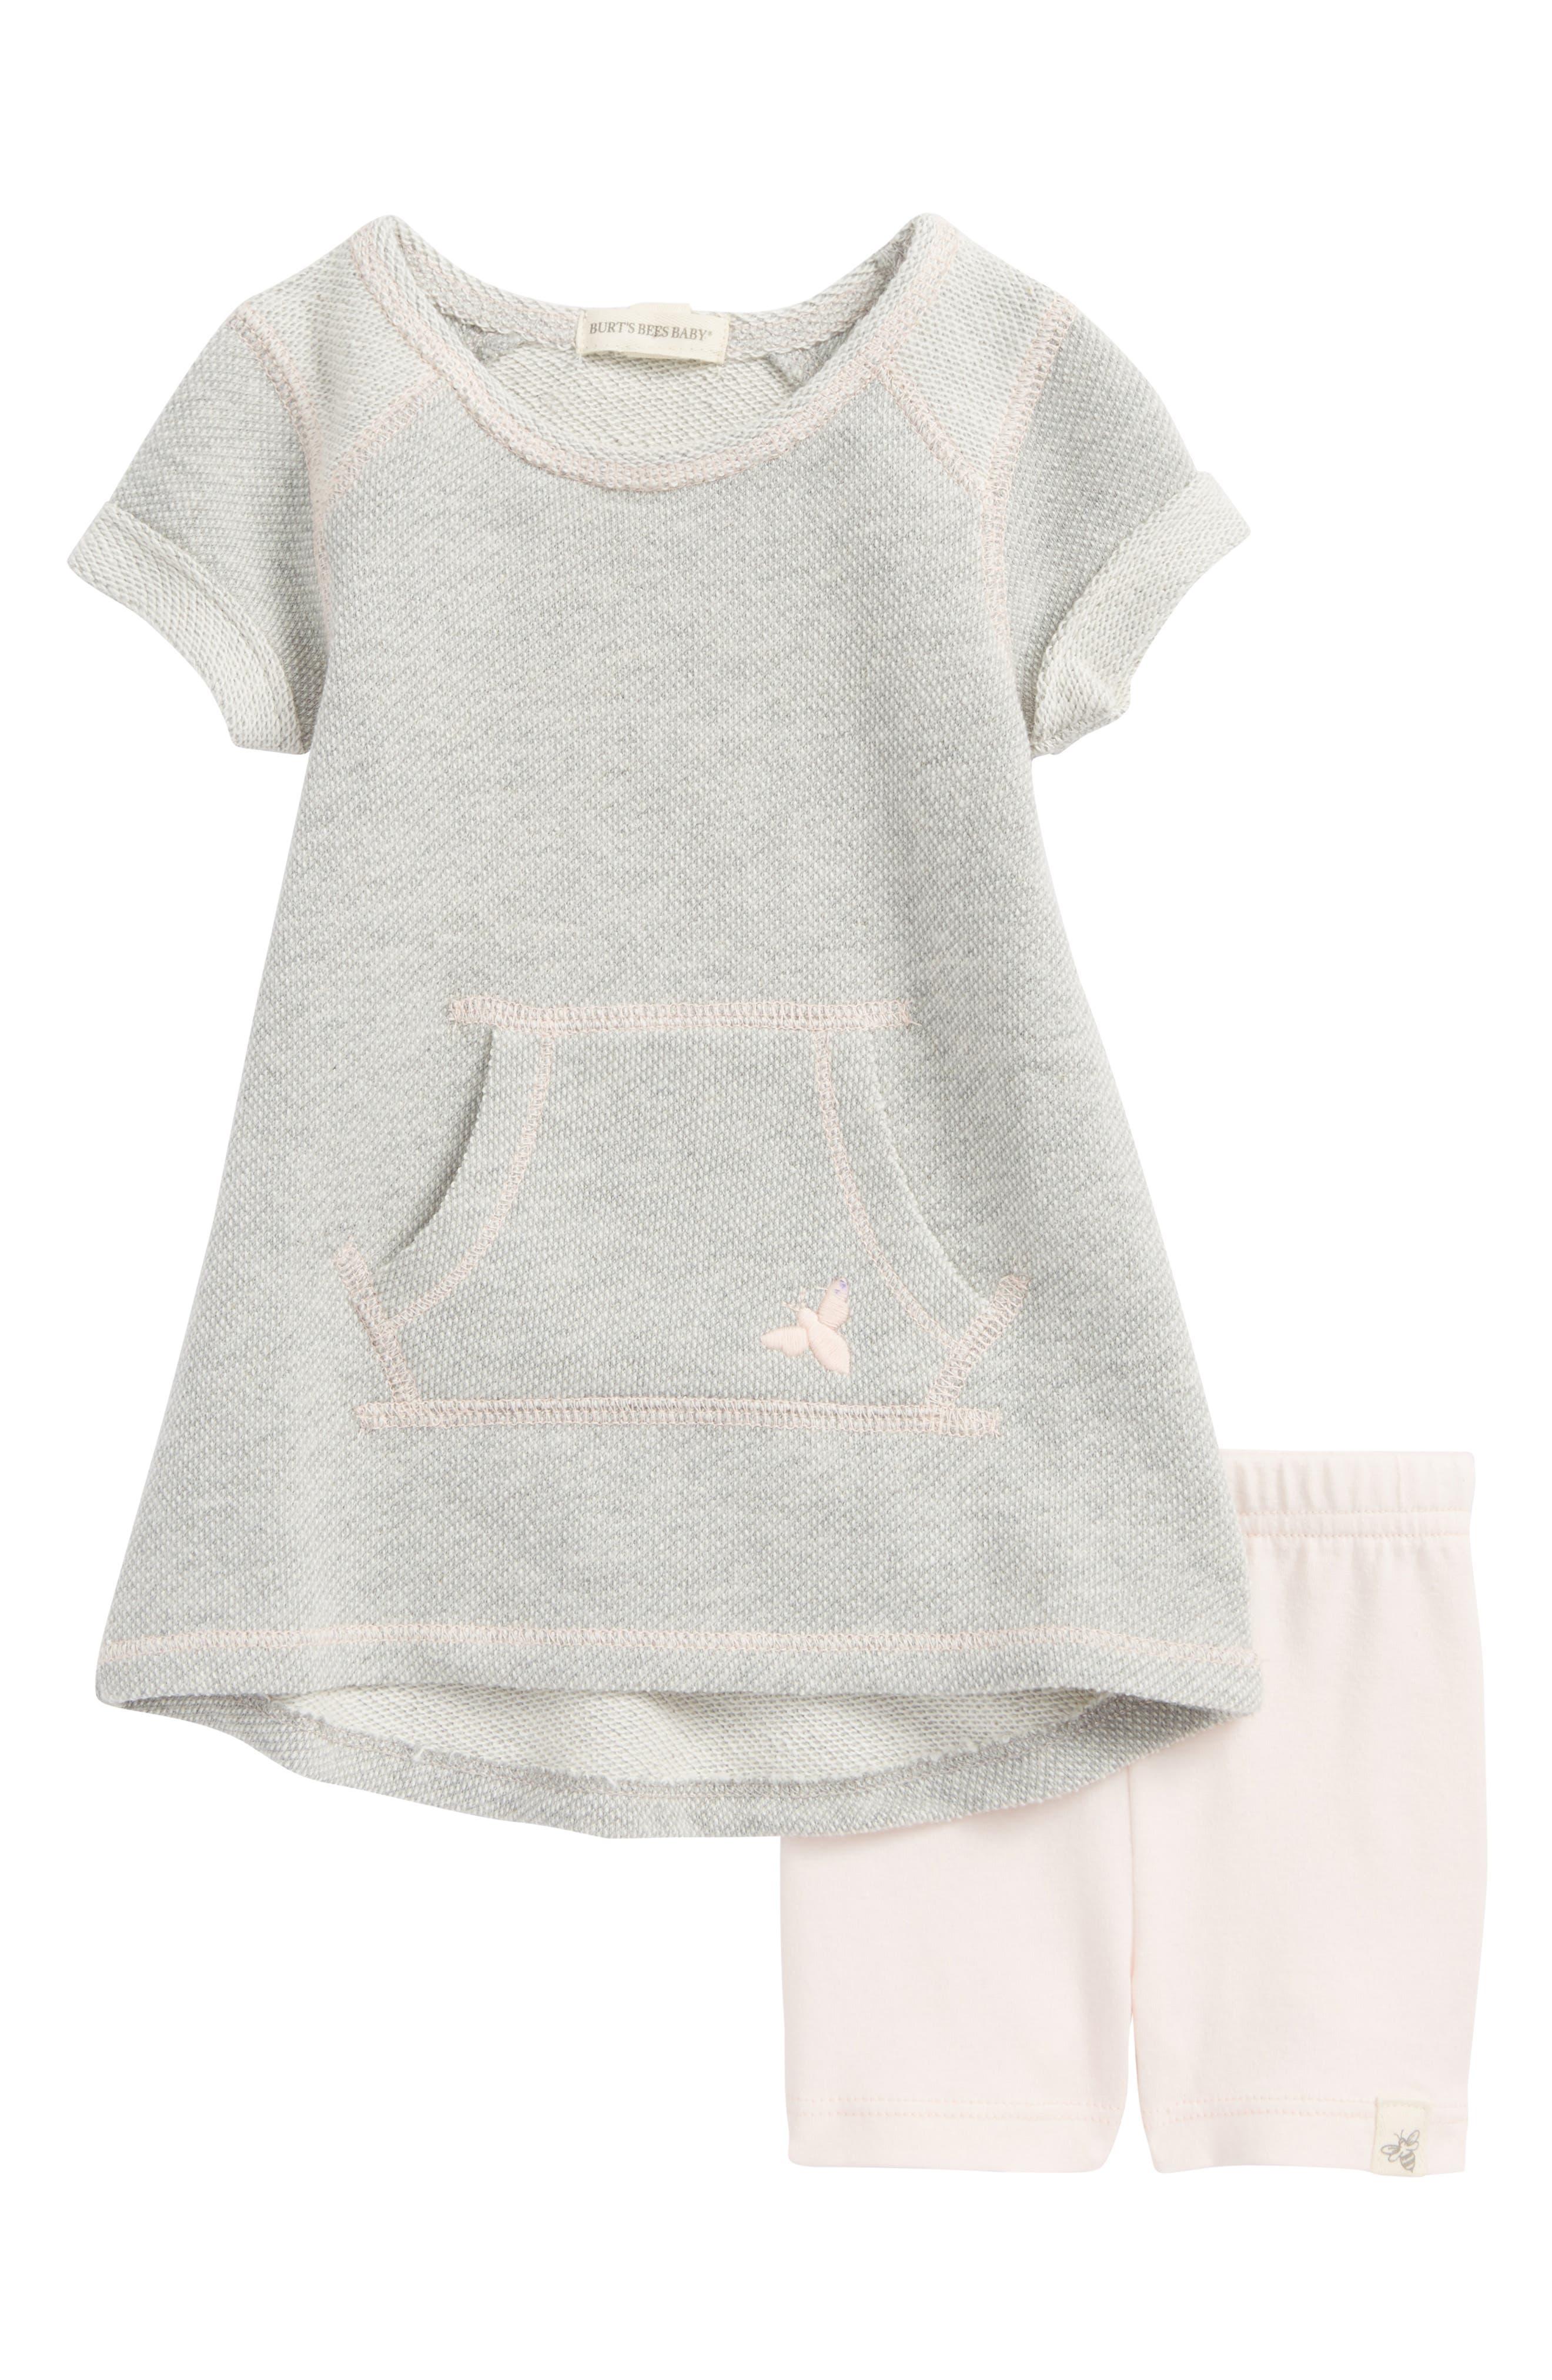 Piqué Organic Cotton Dress & Shorts Set,                             Main thumbnail 1, color,                             050